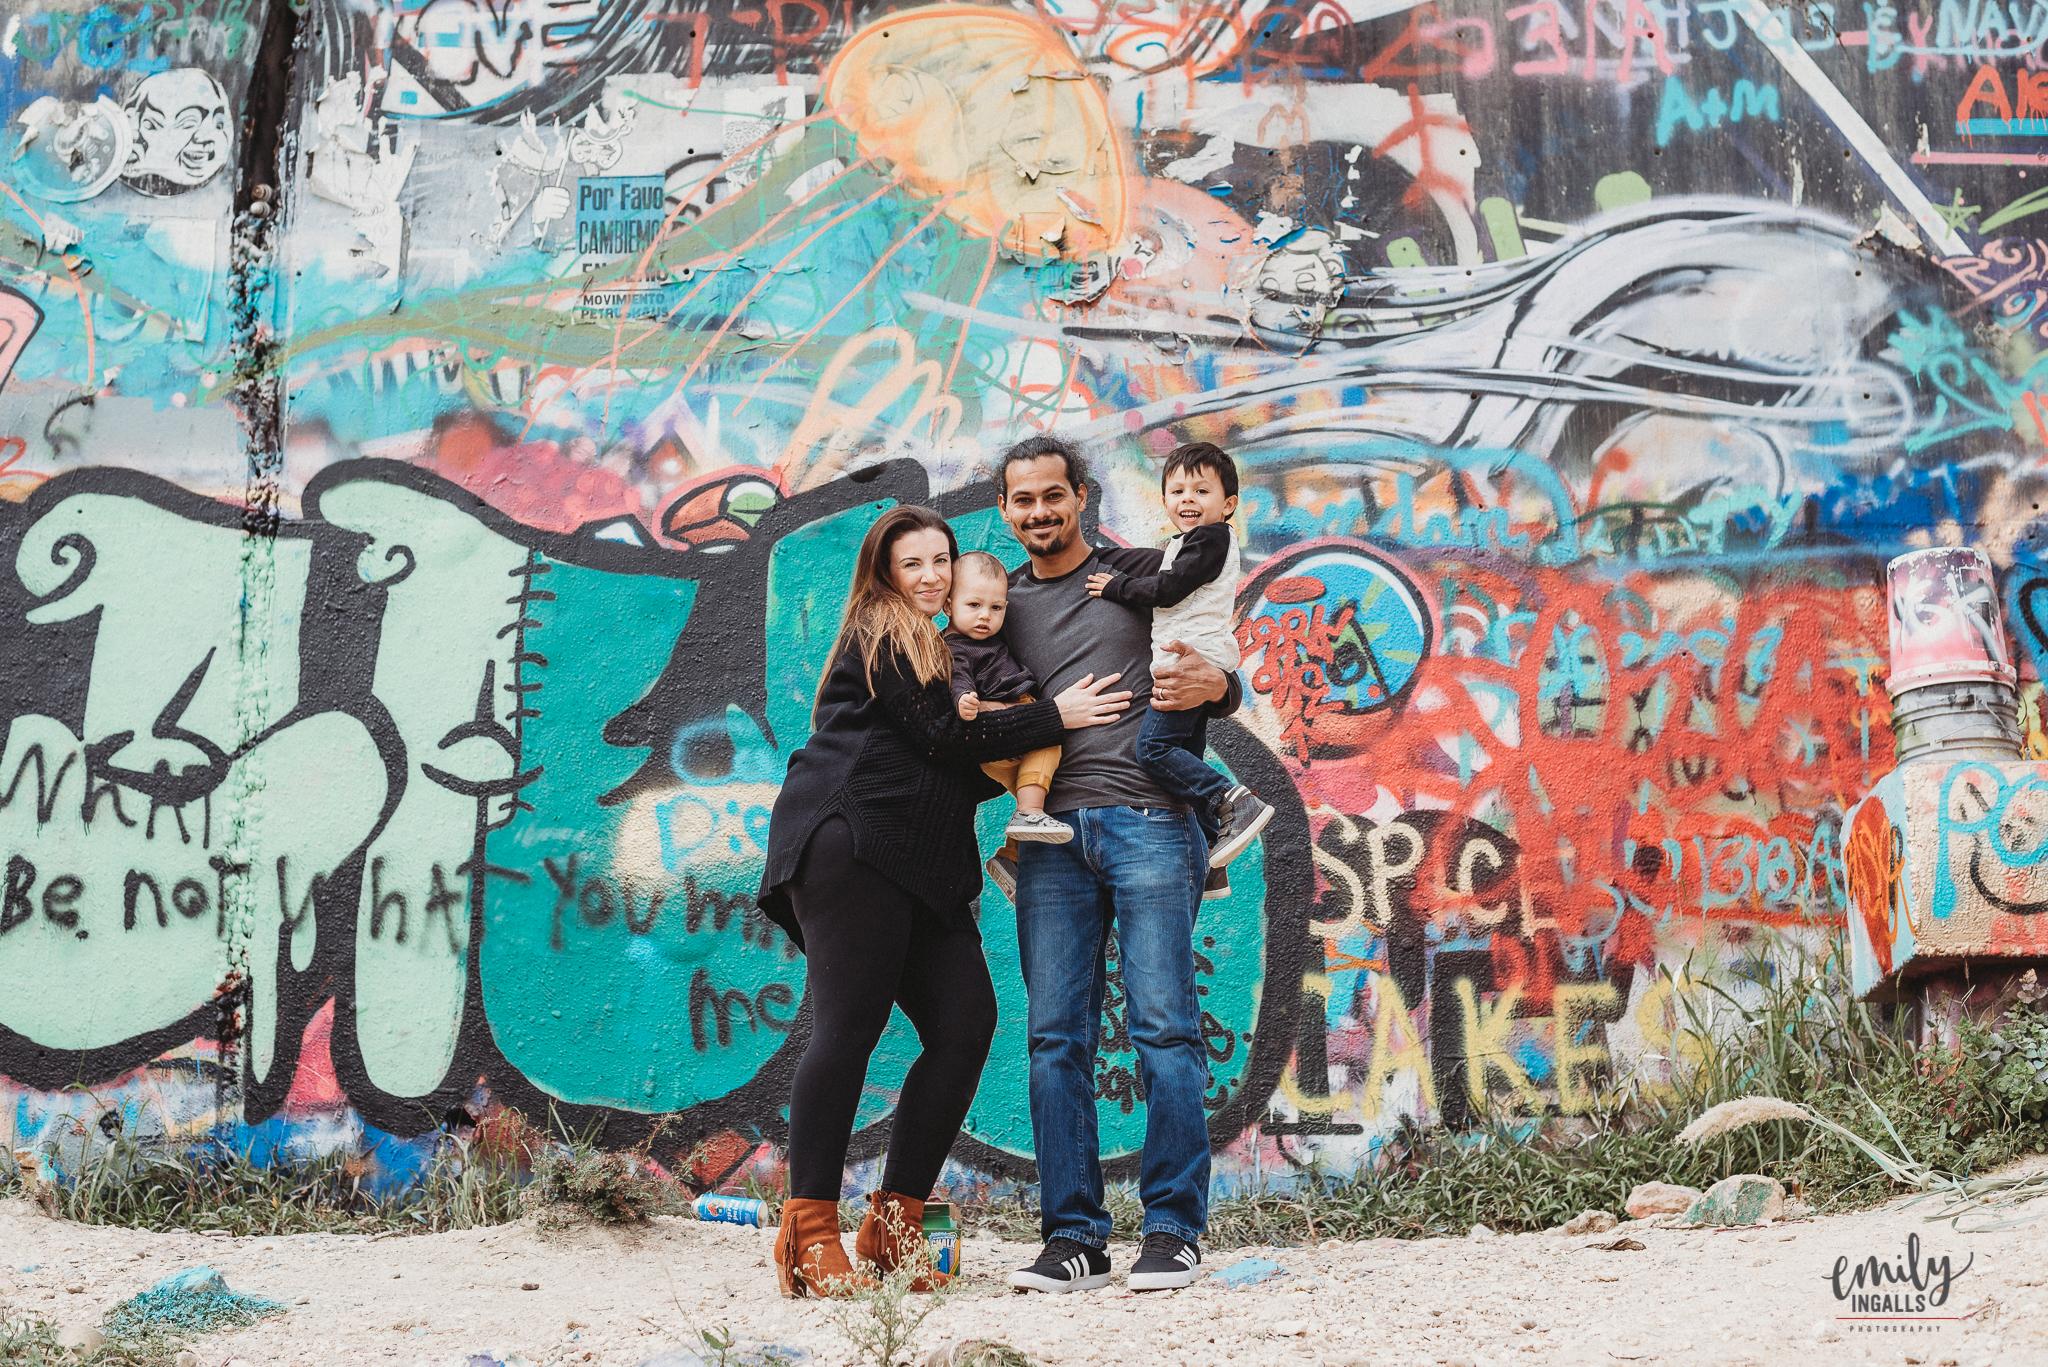 Family Photographer_Round Rock Photographer_Emily Ingalls Photography_Austin Photographer_Pflugerville Photographer_Georgetown Photographer_Graffiti Hill at Castle Park, Austin-5.jpg